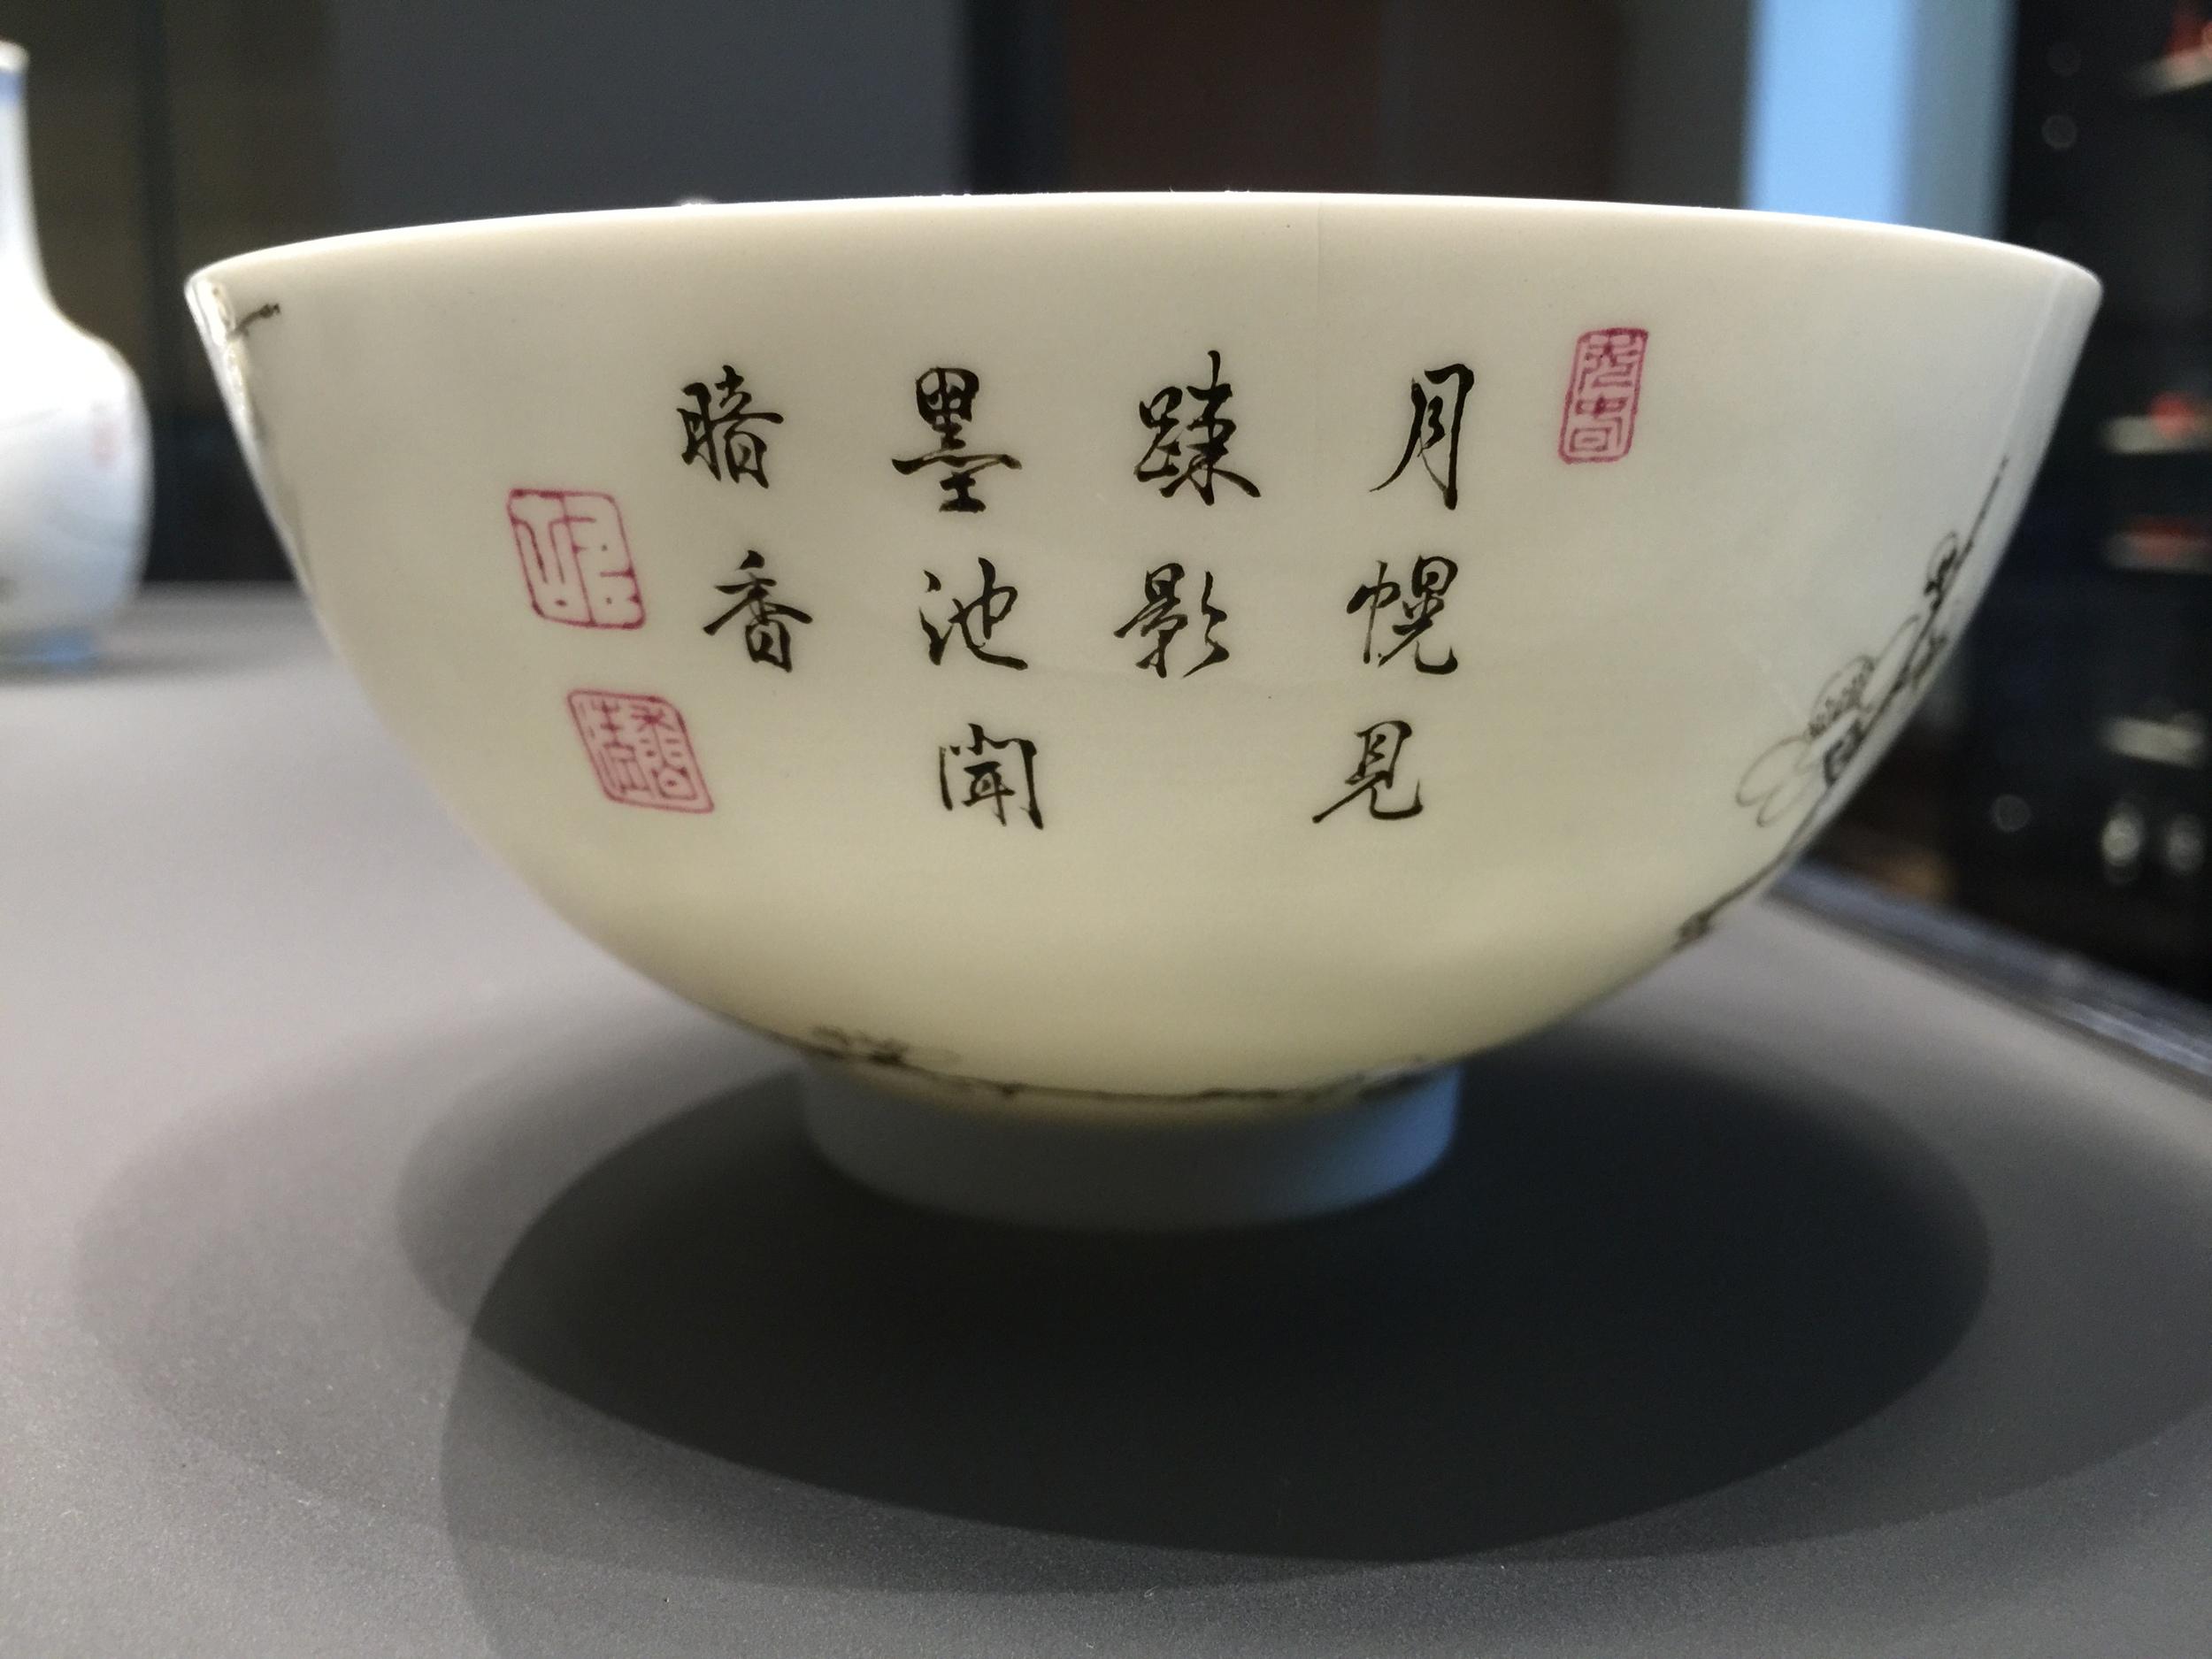 Chinese-Porcelain-British-Museum-Percival-David-jessewaugh.com-106.jpg